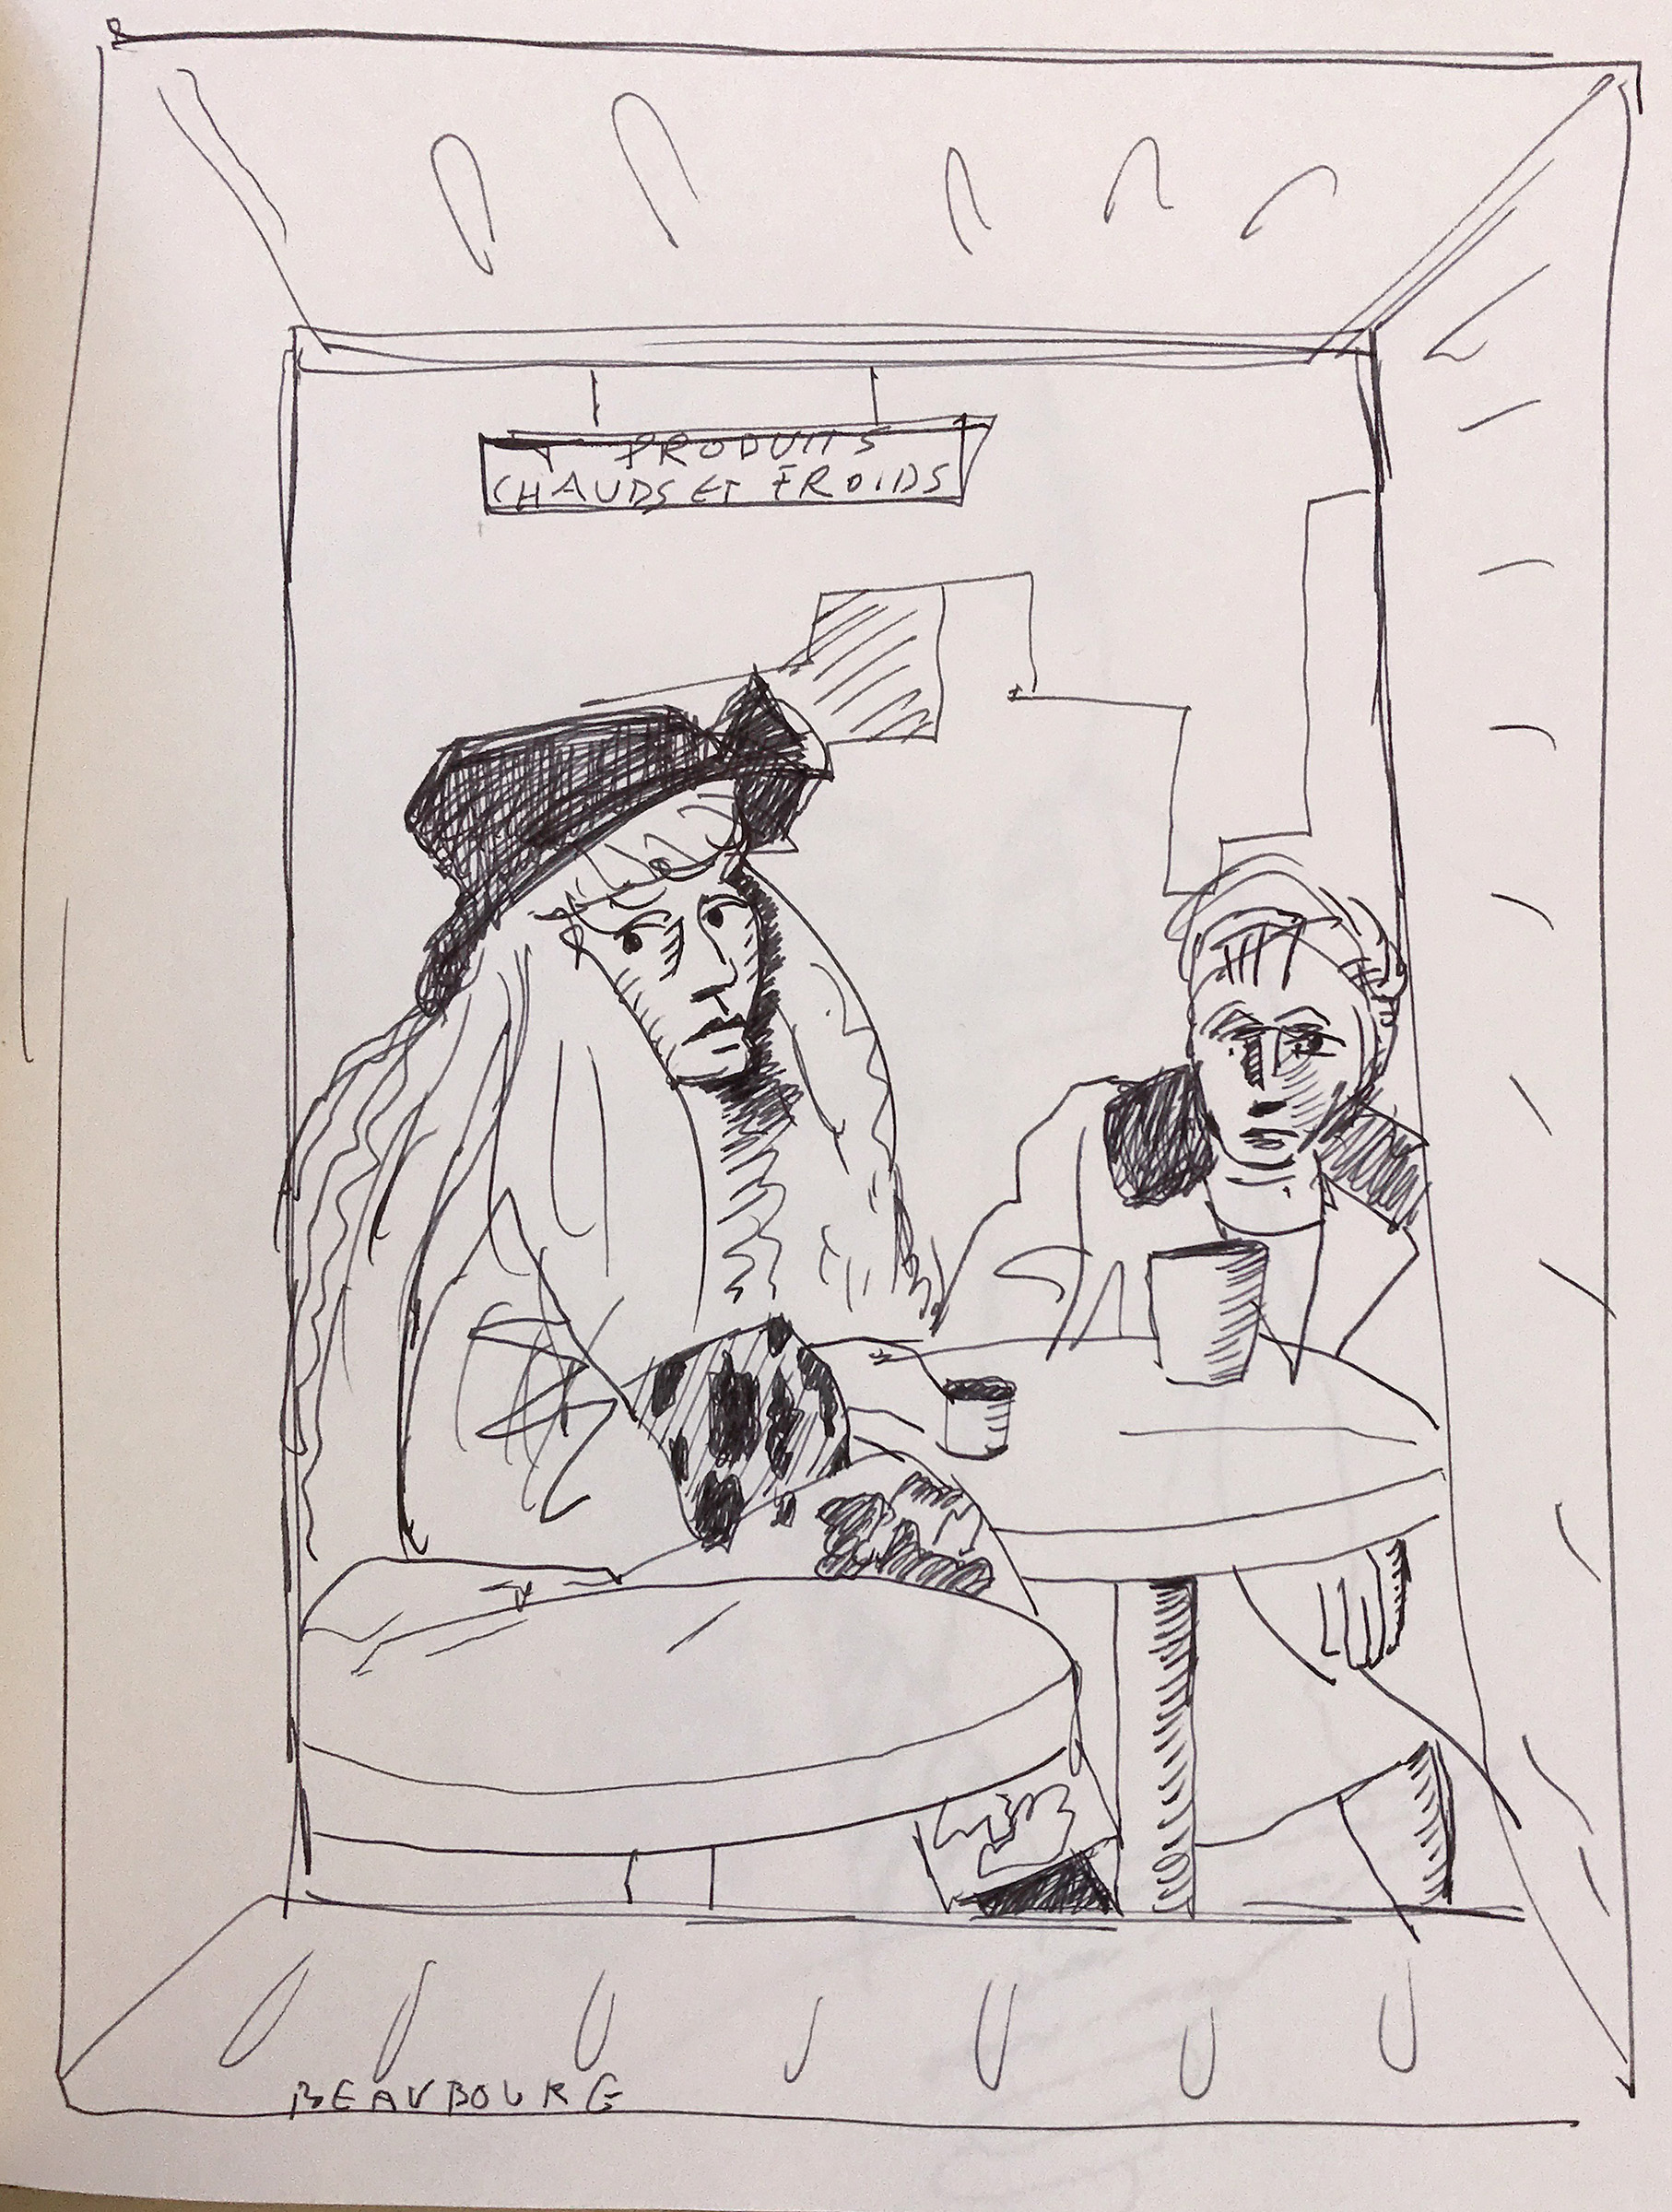 Beauborg drawing